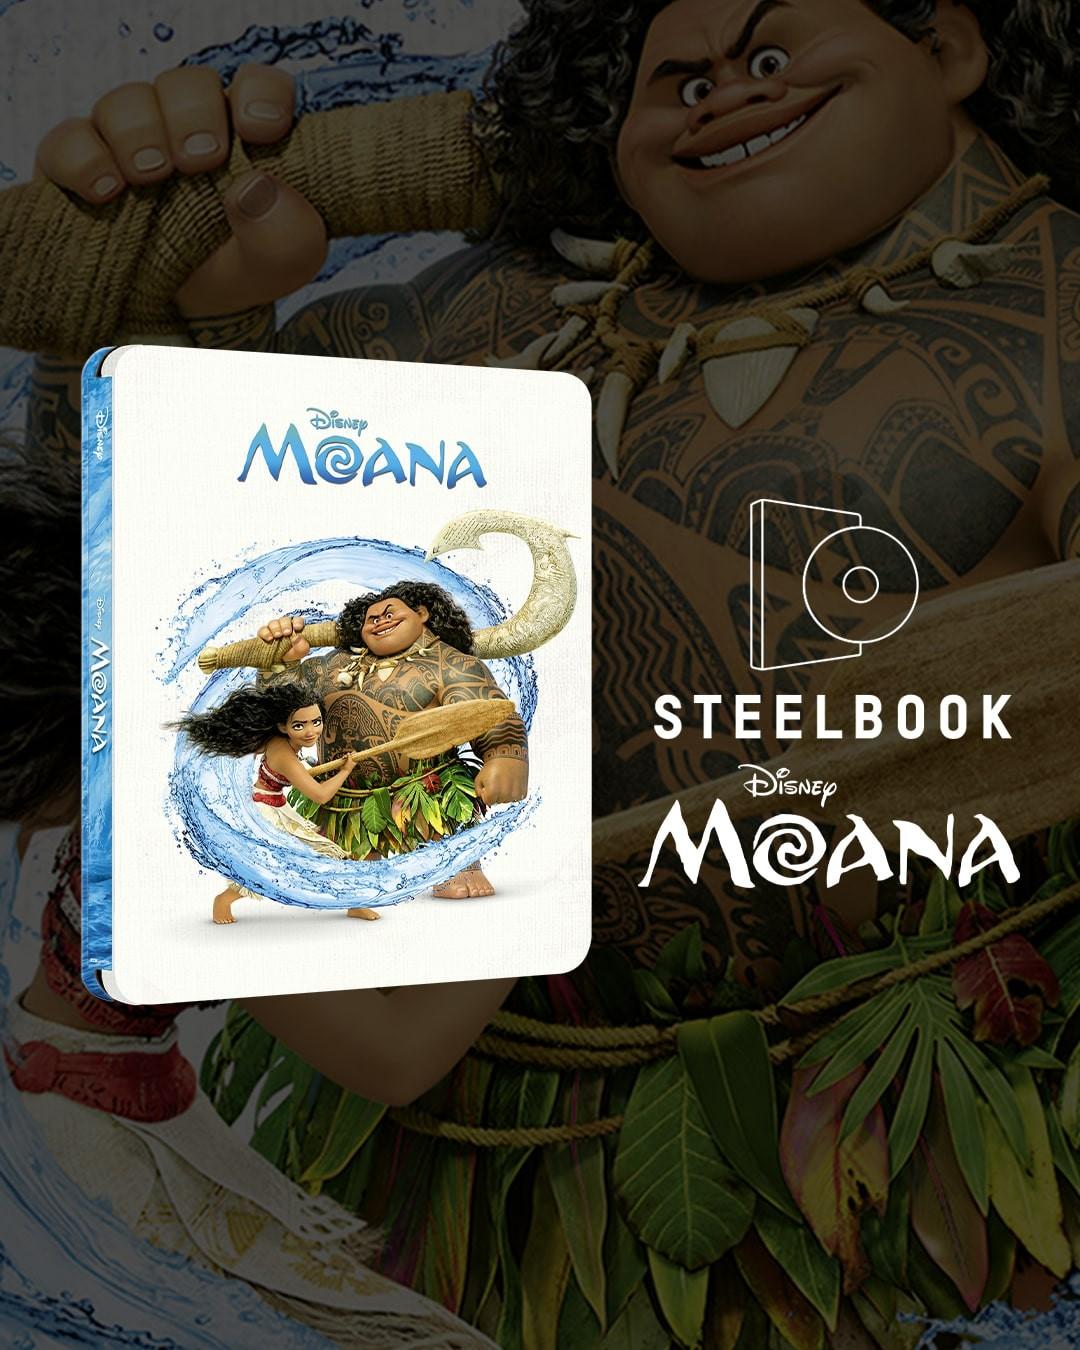 0119-GCI037-Z-TL-Disney_Steelbooks_Moana-1080x1350-min.jpg